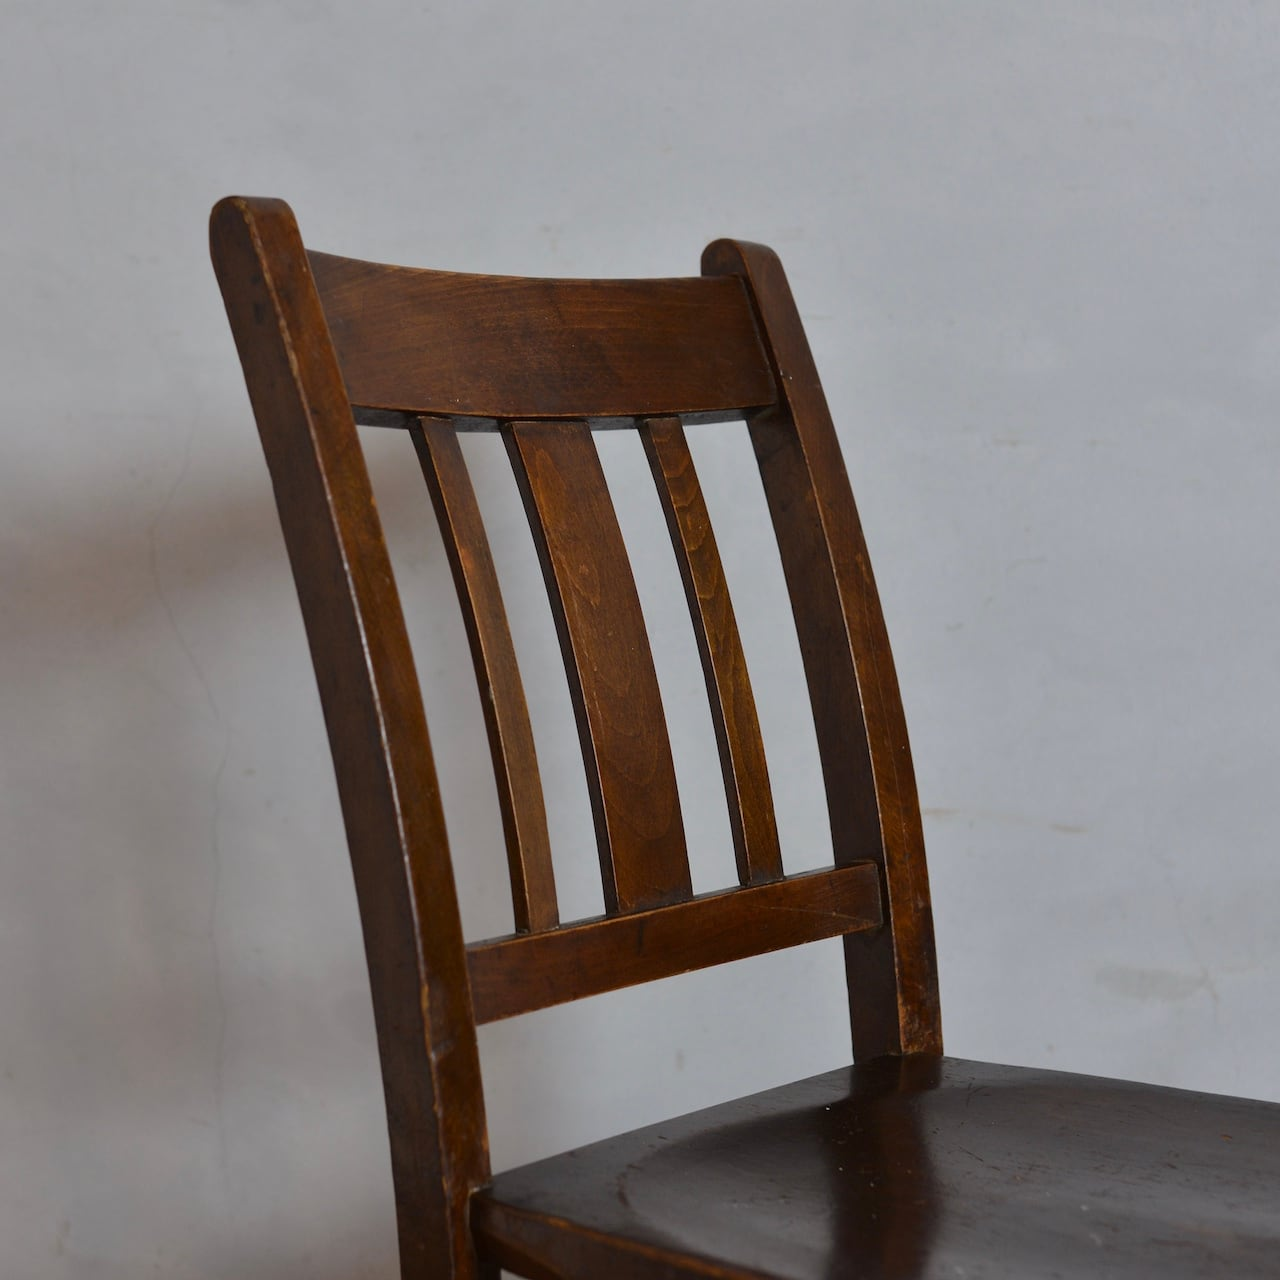 School Chair  / スクール チェア 【A】〈ダイニングチェア・デスクチェア・椅子〉 2901-16010216